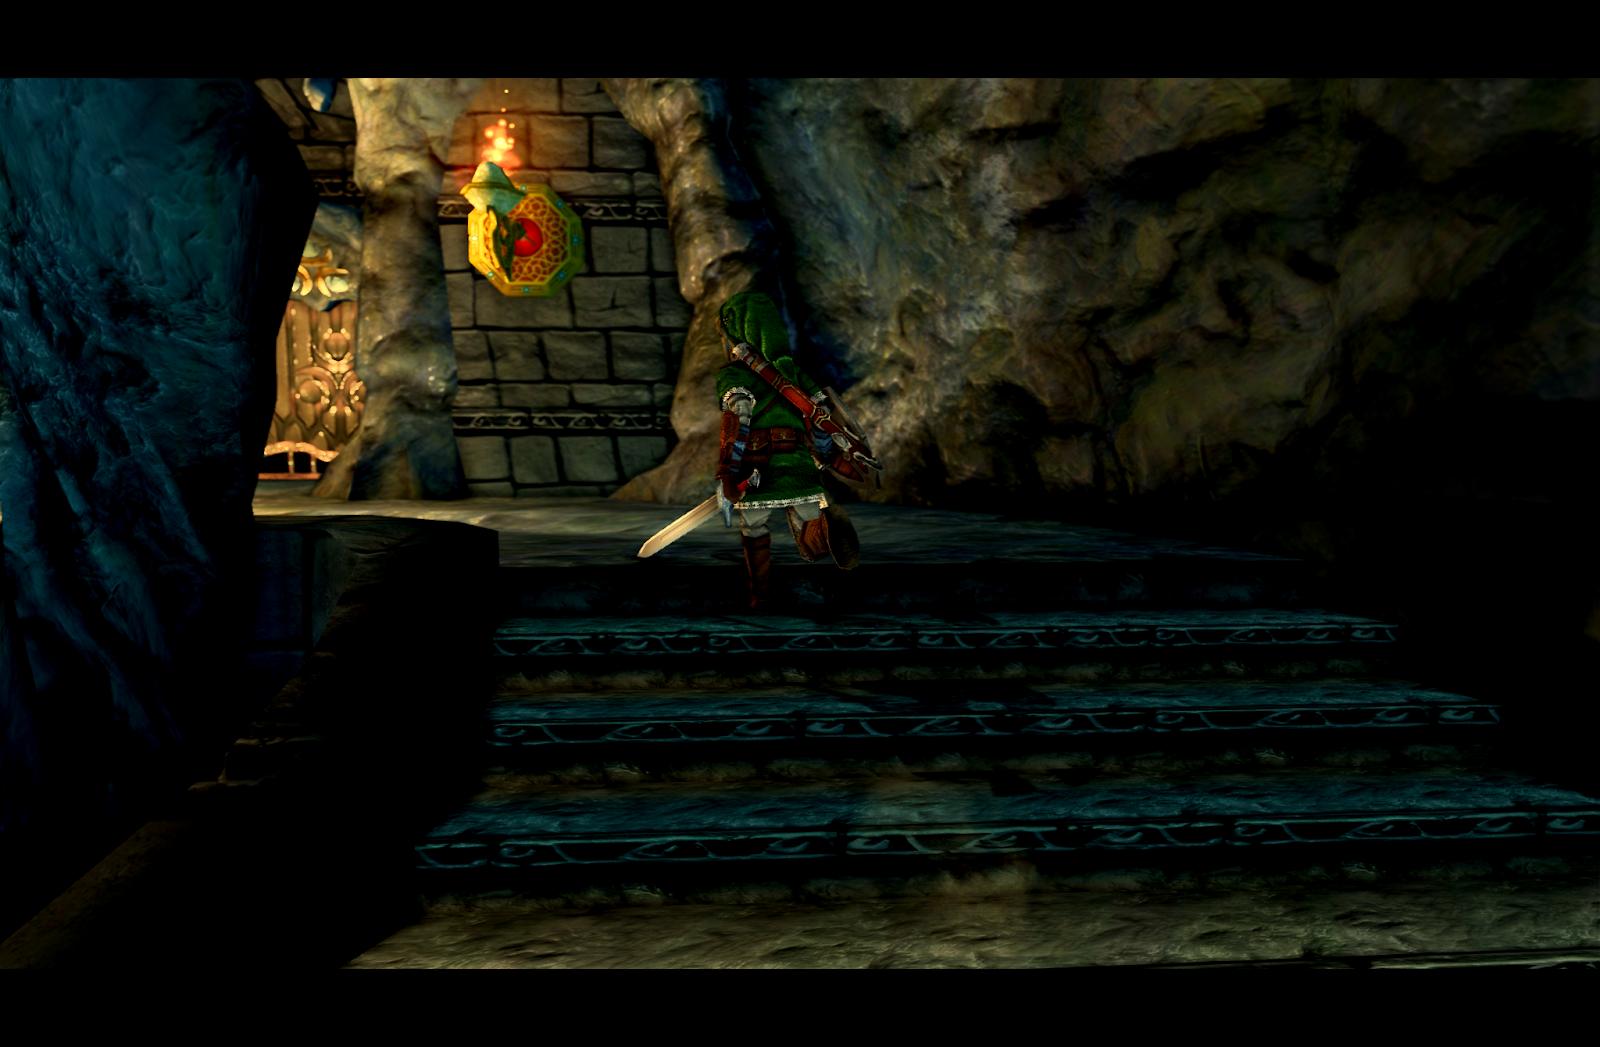 The Legend of Zelda: Twilight Princess HD Remake Project 5